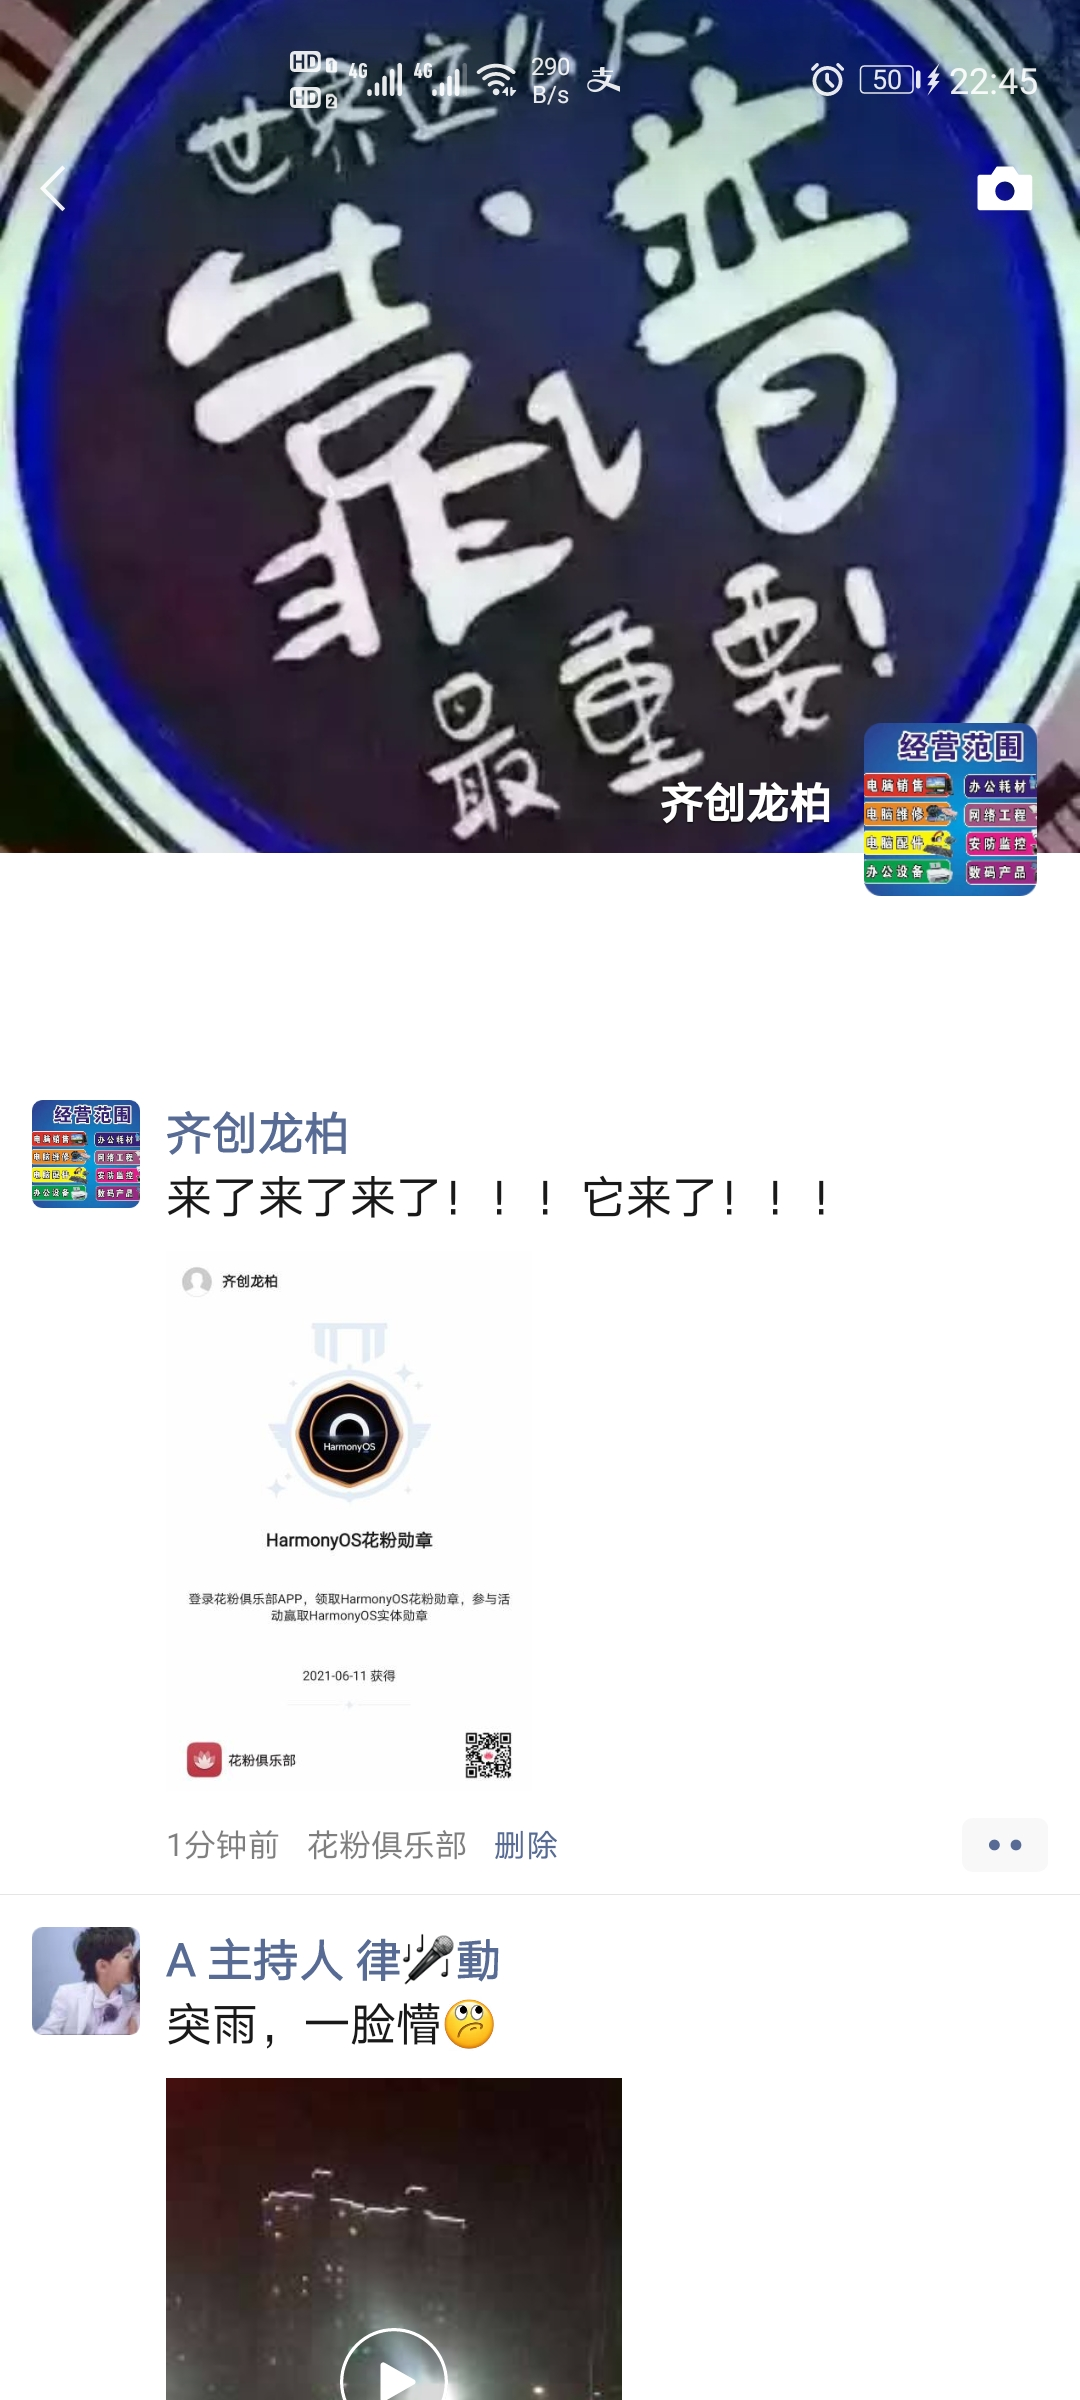 Screenshot_20210611_224553_com.tencent.mm.jpg